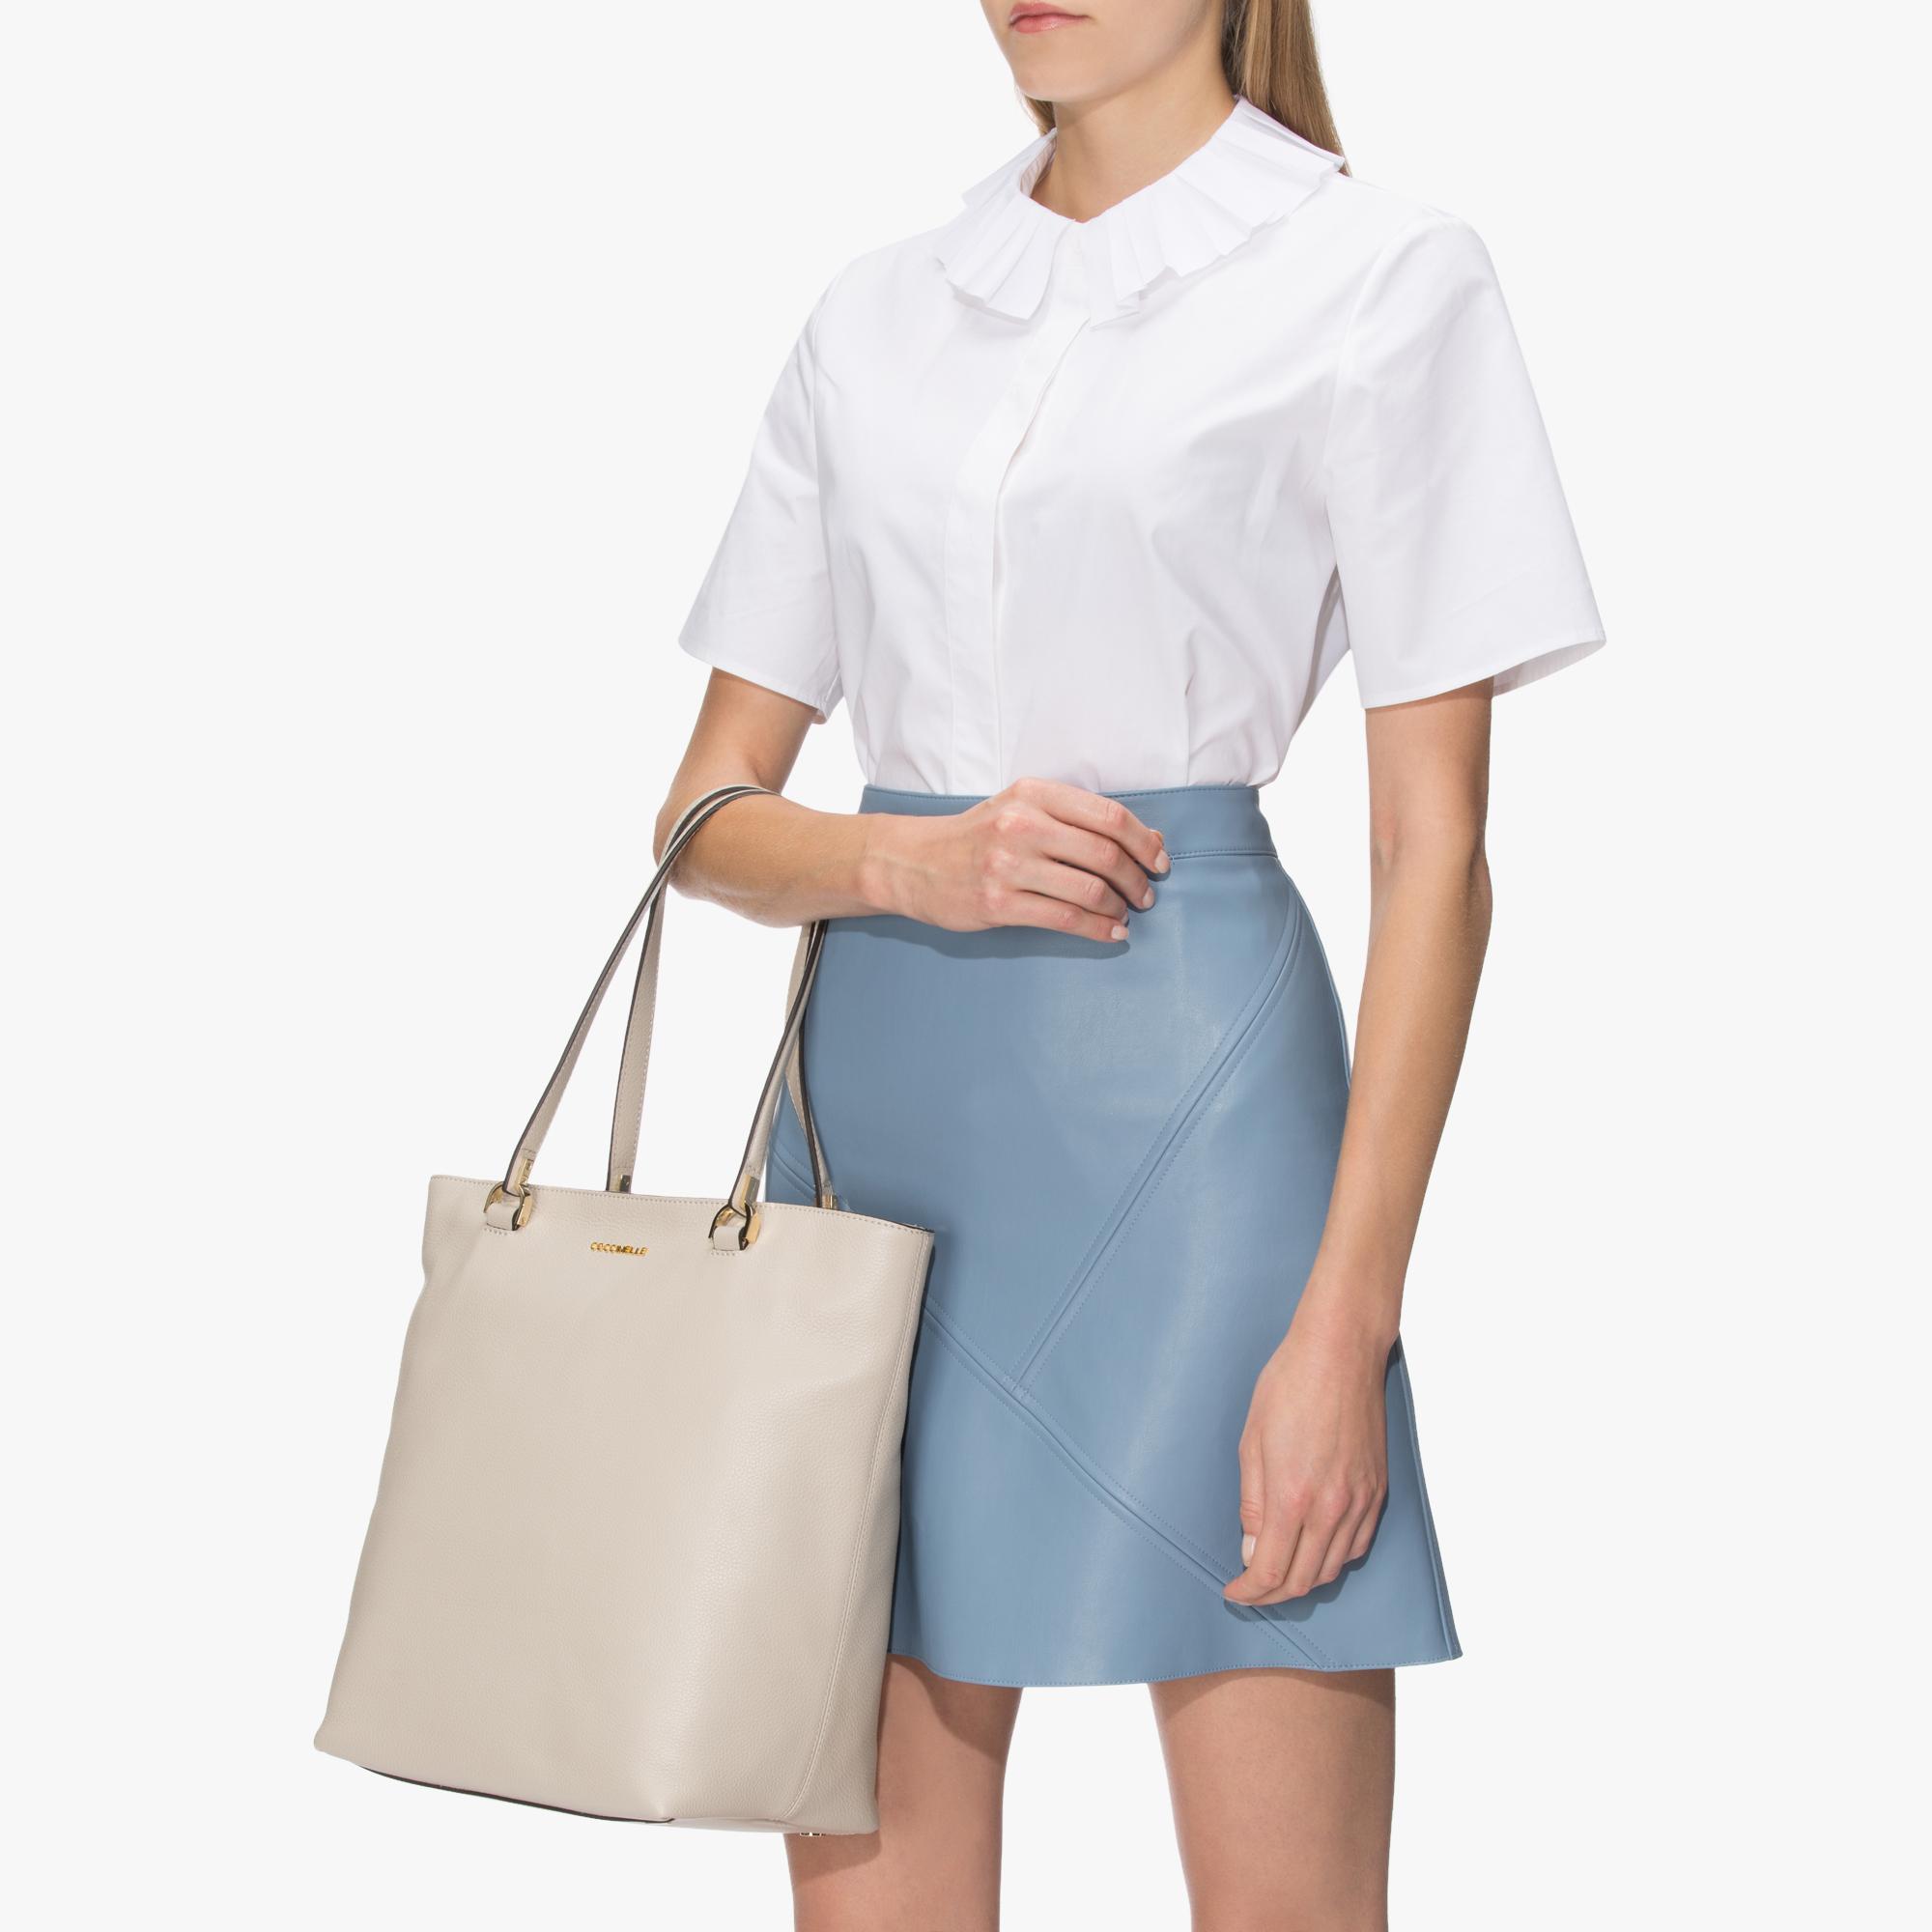 Keyla Leather shopping tote